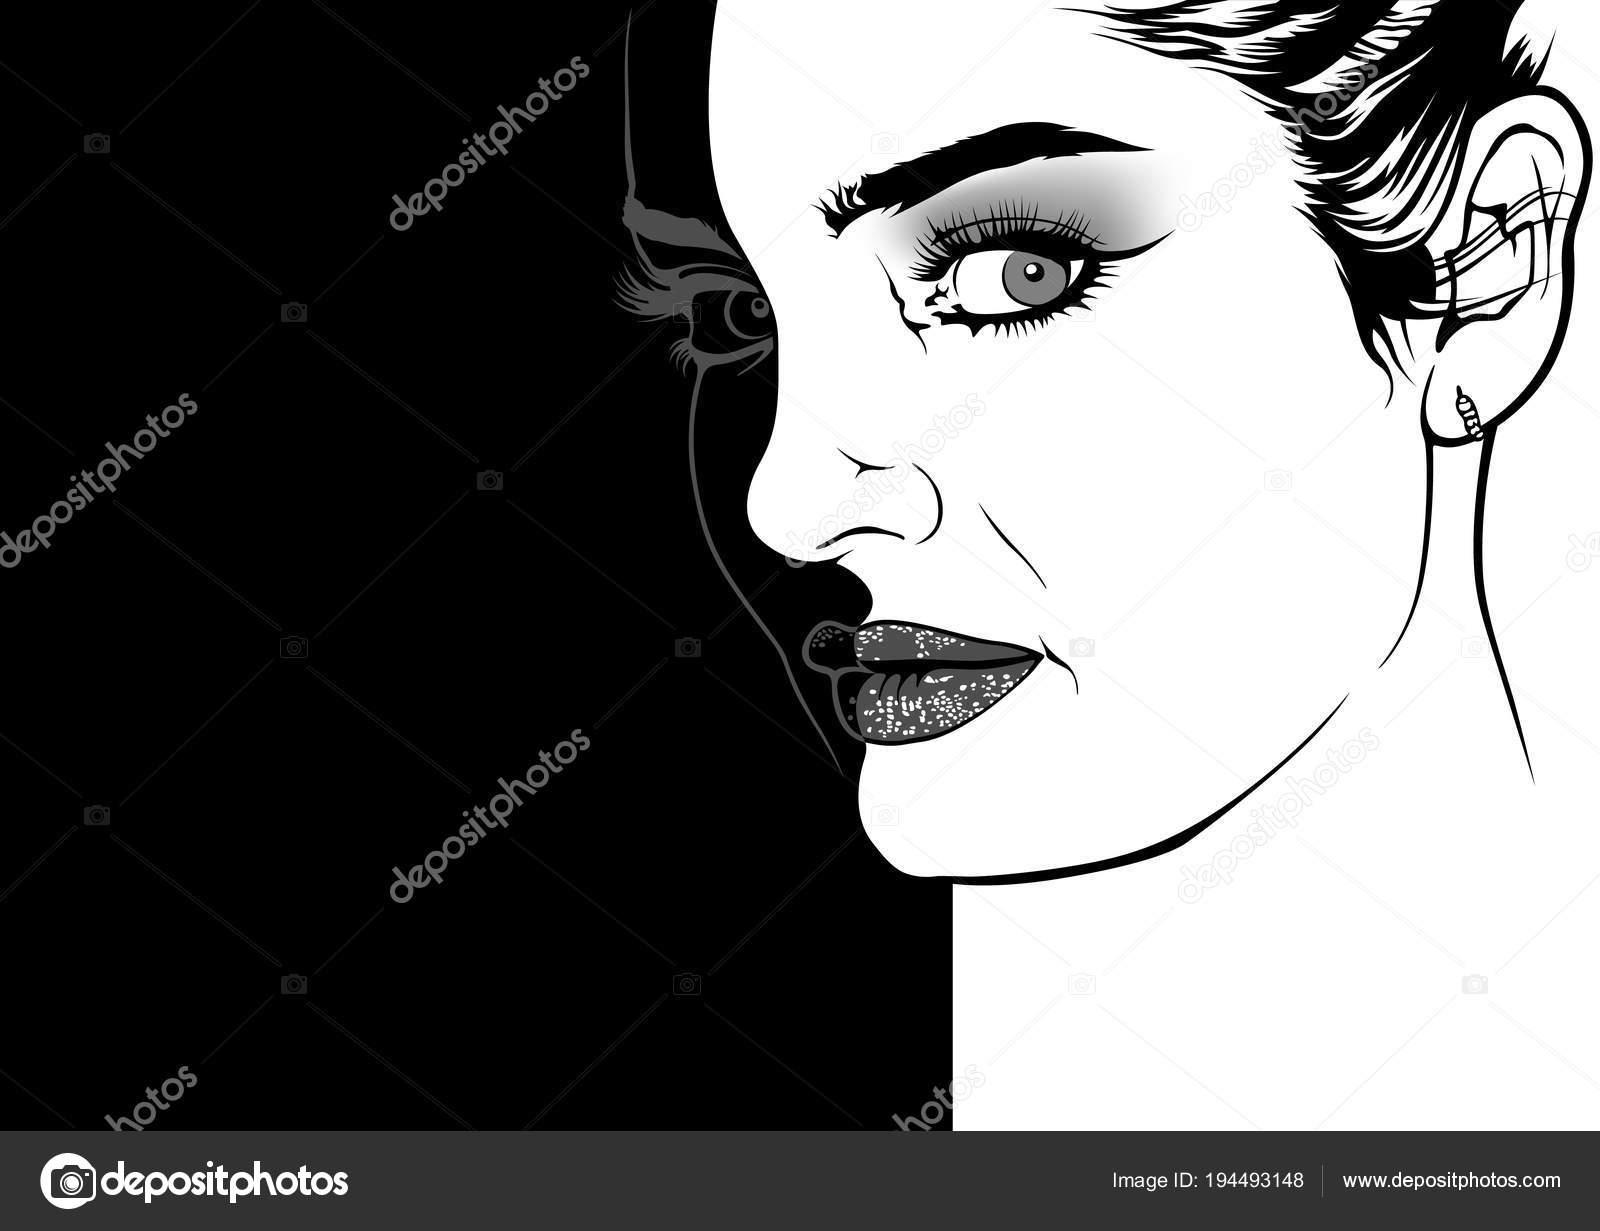 Visage Femme Avec Maquillage Mode Noir Blanc Dessin Illustration Sur